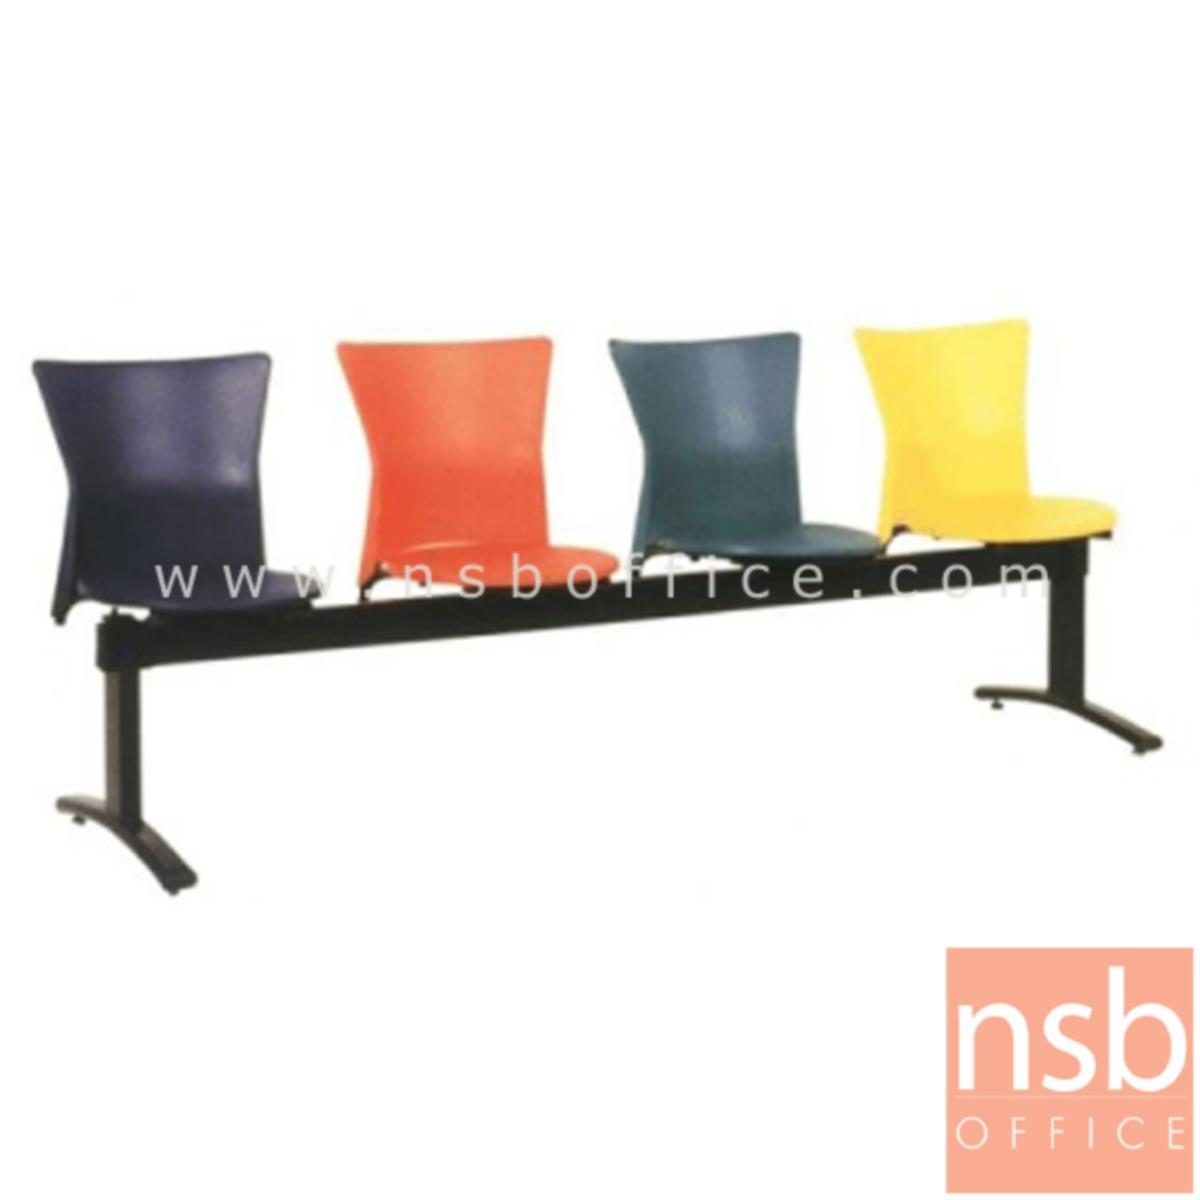 B06A046:เก้าอี้นั่งคอยเฟรมโพลี่ทรงถ้วย รุ่น B321 2 ,3 ,4 ที่นั่ง ขนาด 94W ,150W ,205W cm. ขาเหล็ก